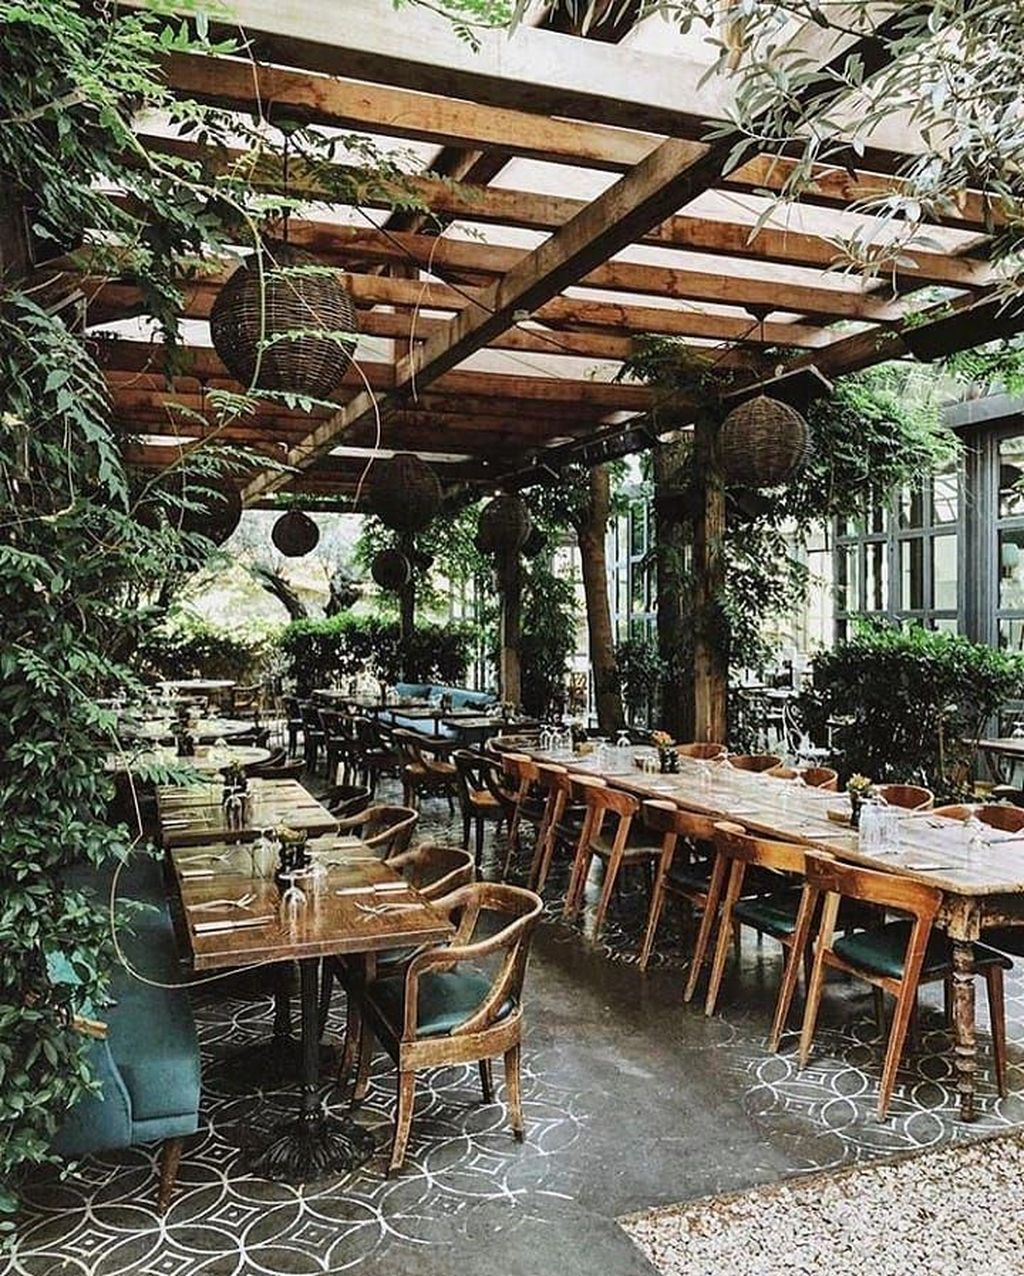 45 Pretty Outdoor Restaurant Patio Design Ideas For Fantastic Dinner Outdoor Restaurant Patio Outdoor Restaurant Design Outdoor Restaurant